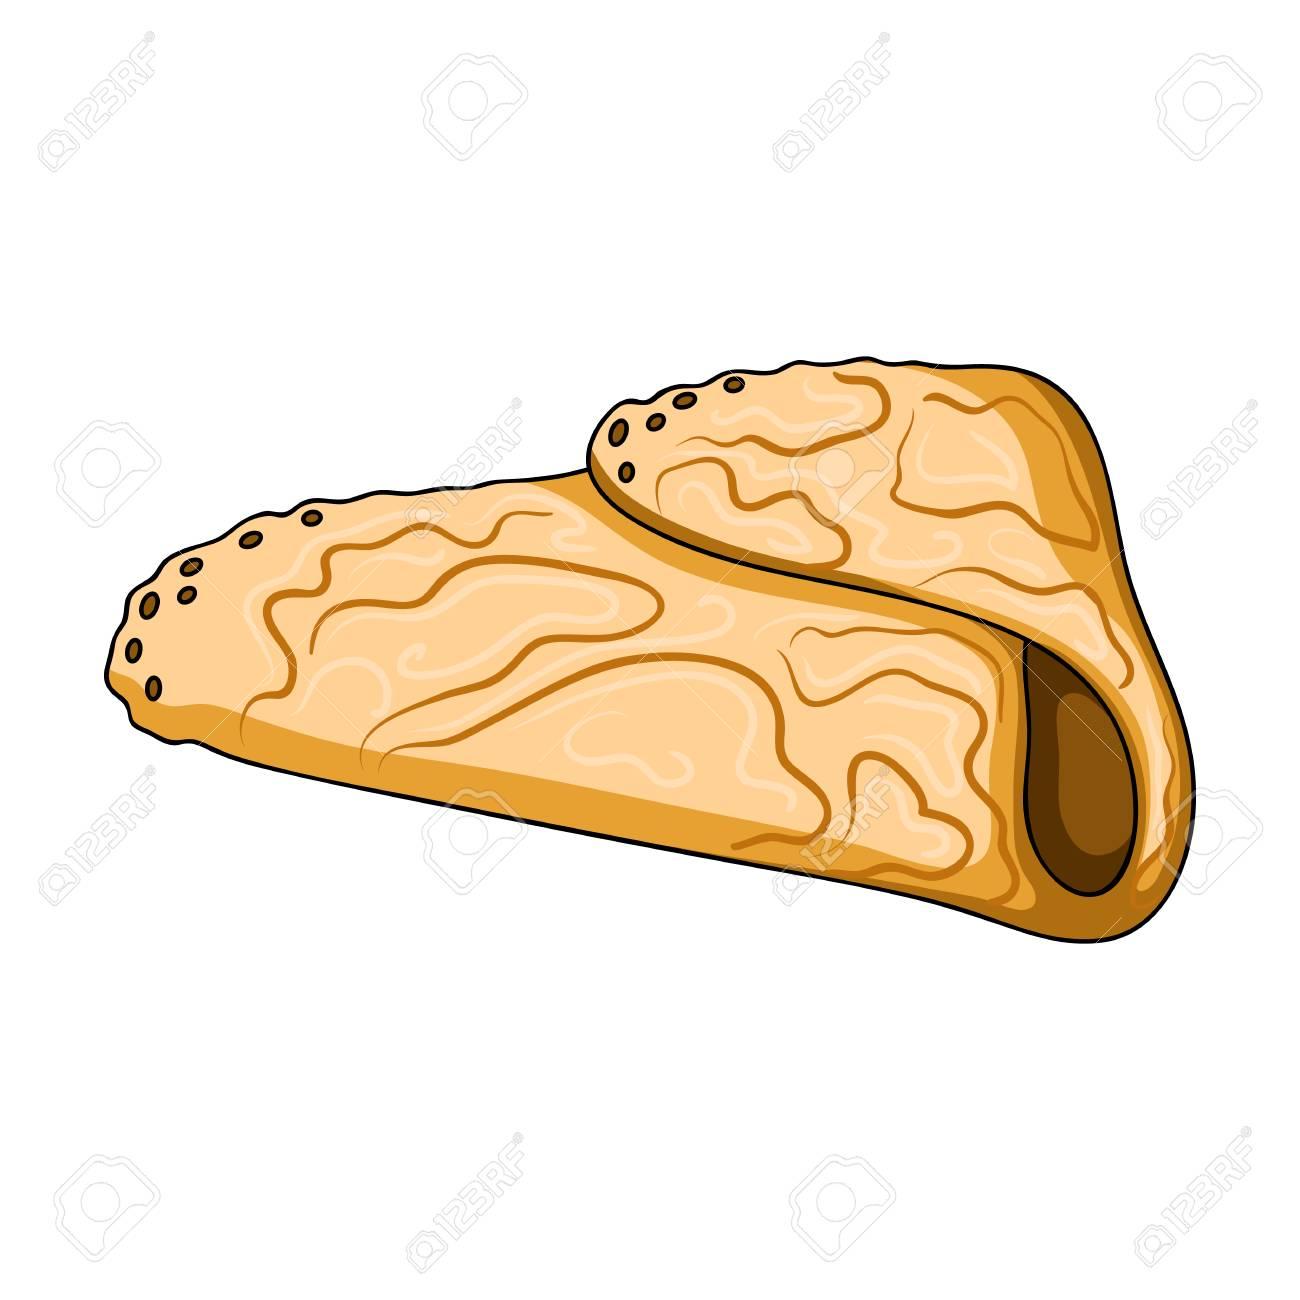 hight resolution of pancake single icon in cartoon style pancake vector symbol stock illustration web